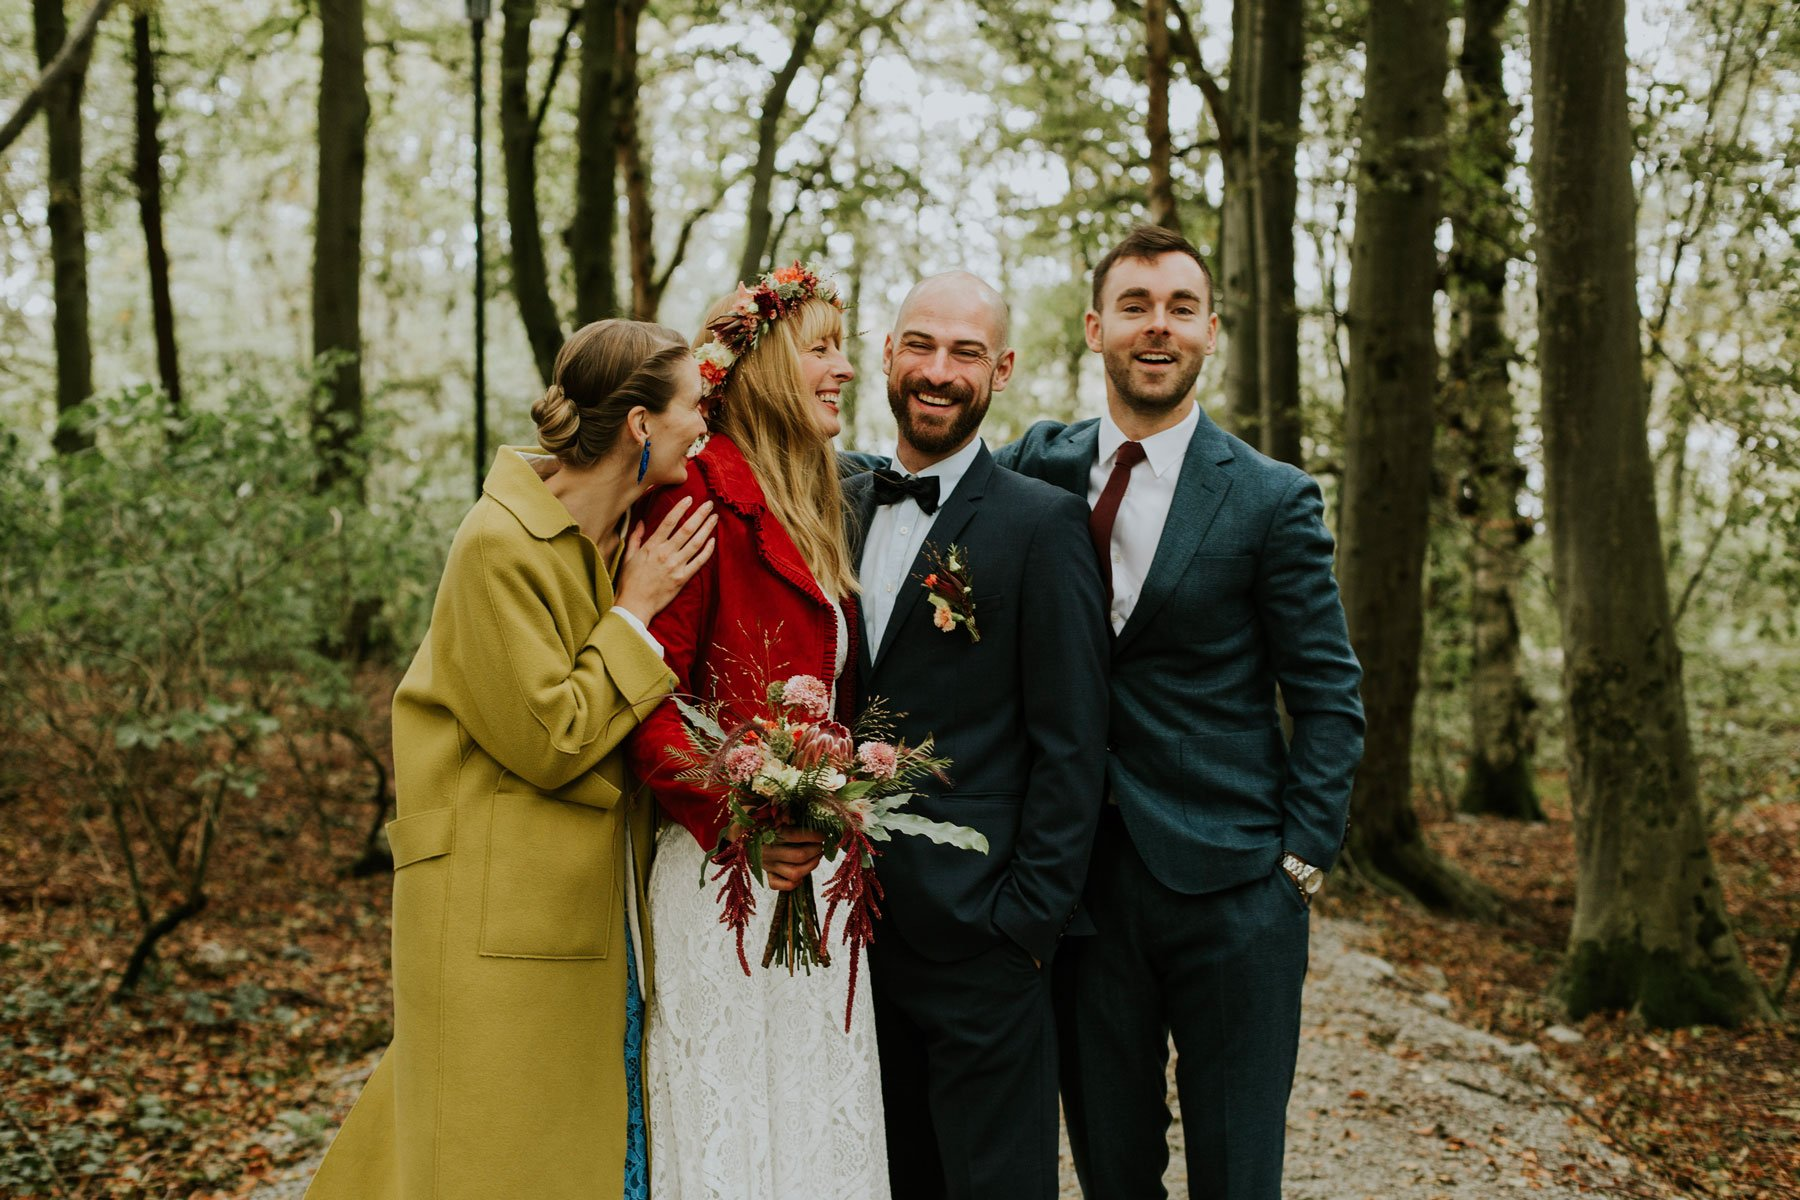 couples norwegian wedding lineowrenfotografi tuvamats